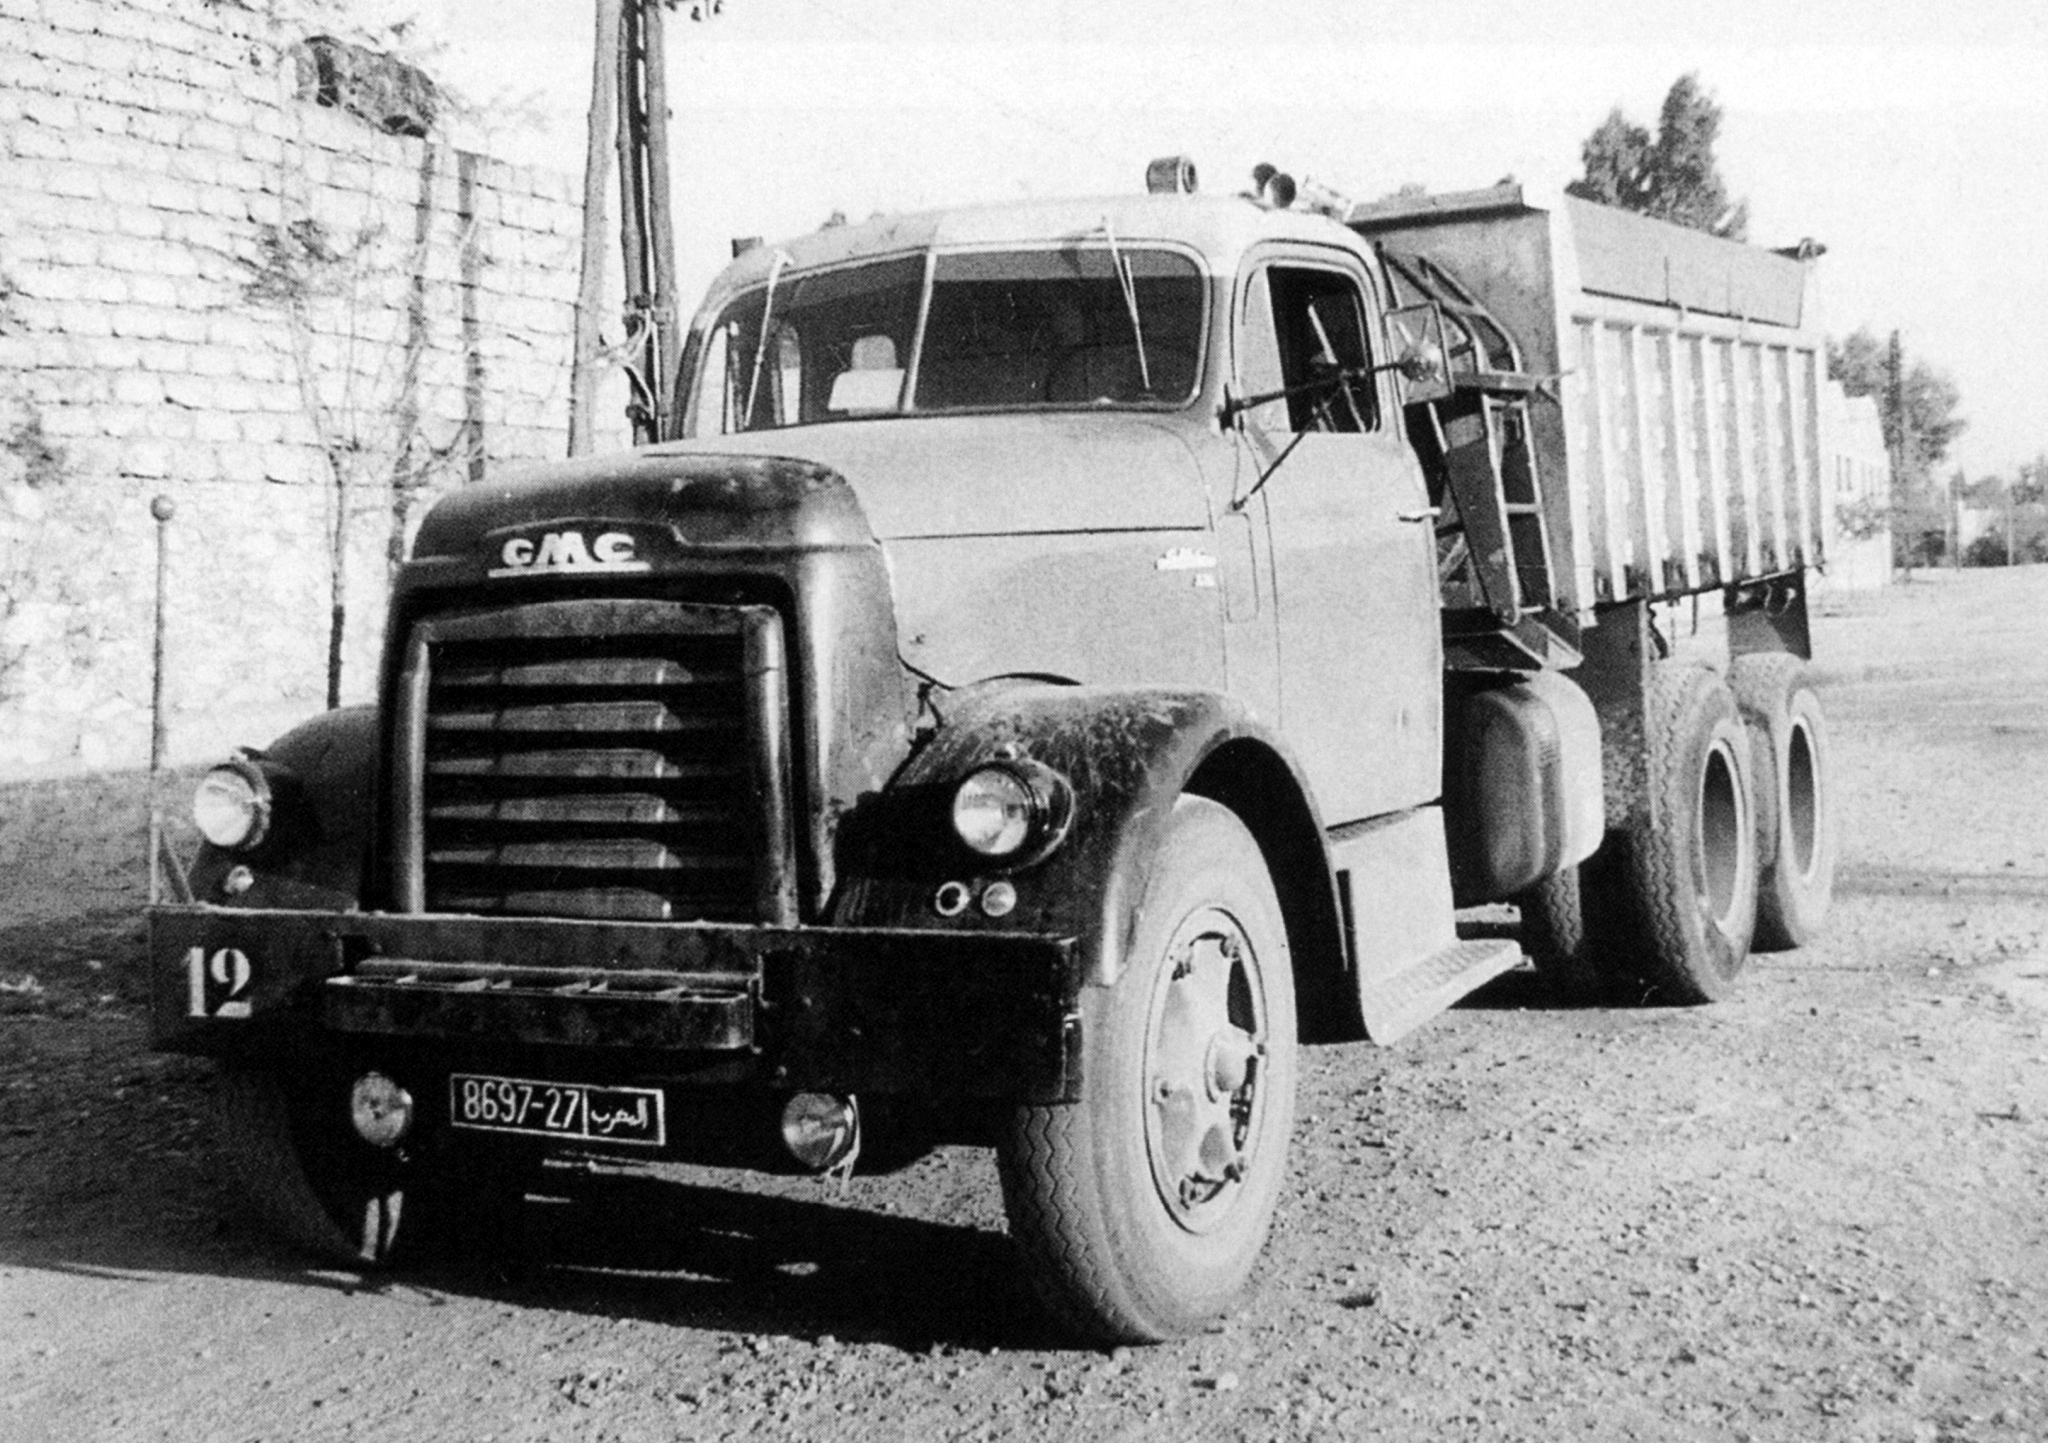 Transport Routier au Maroc - Histoire - Page 3 49888724713_28ff9f2e29_o_d